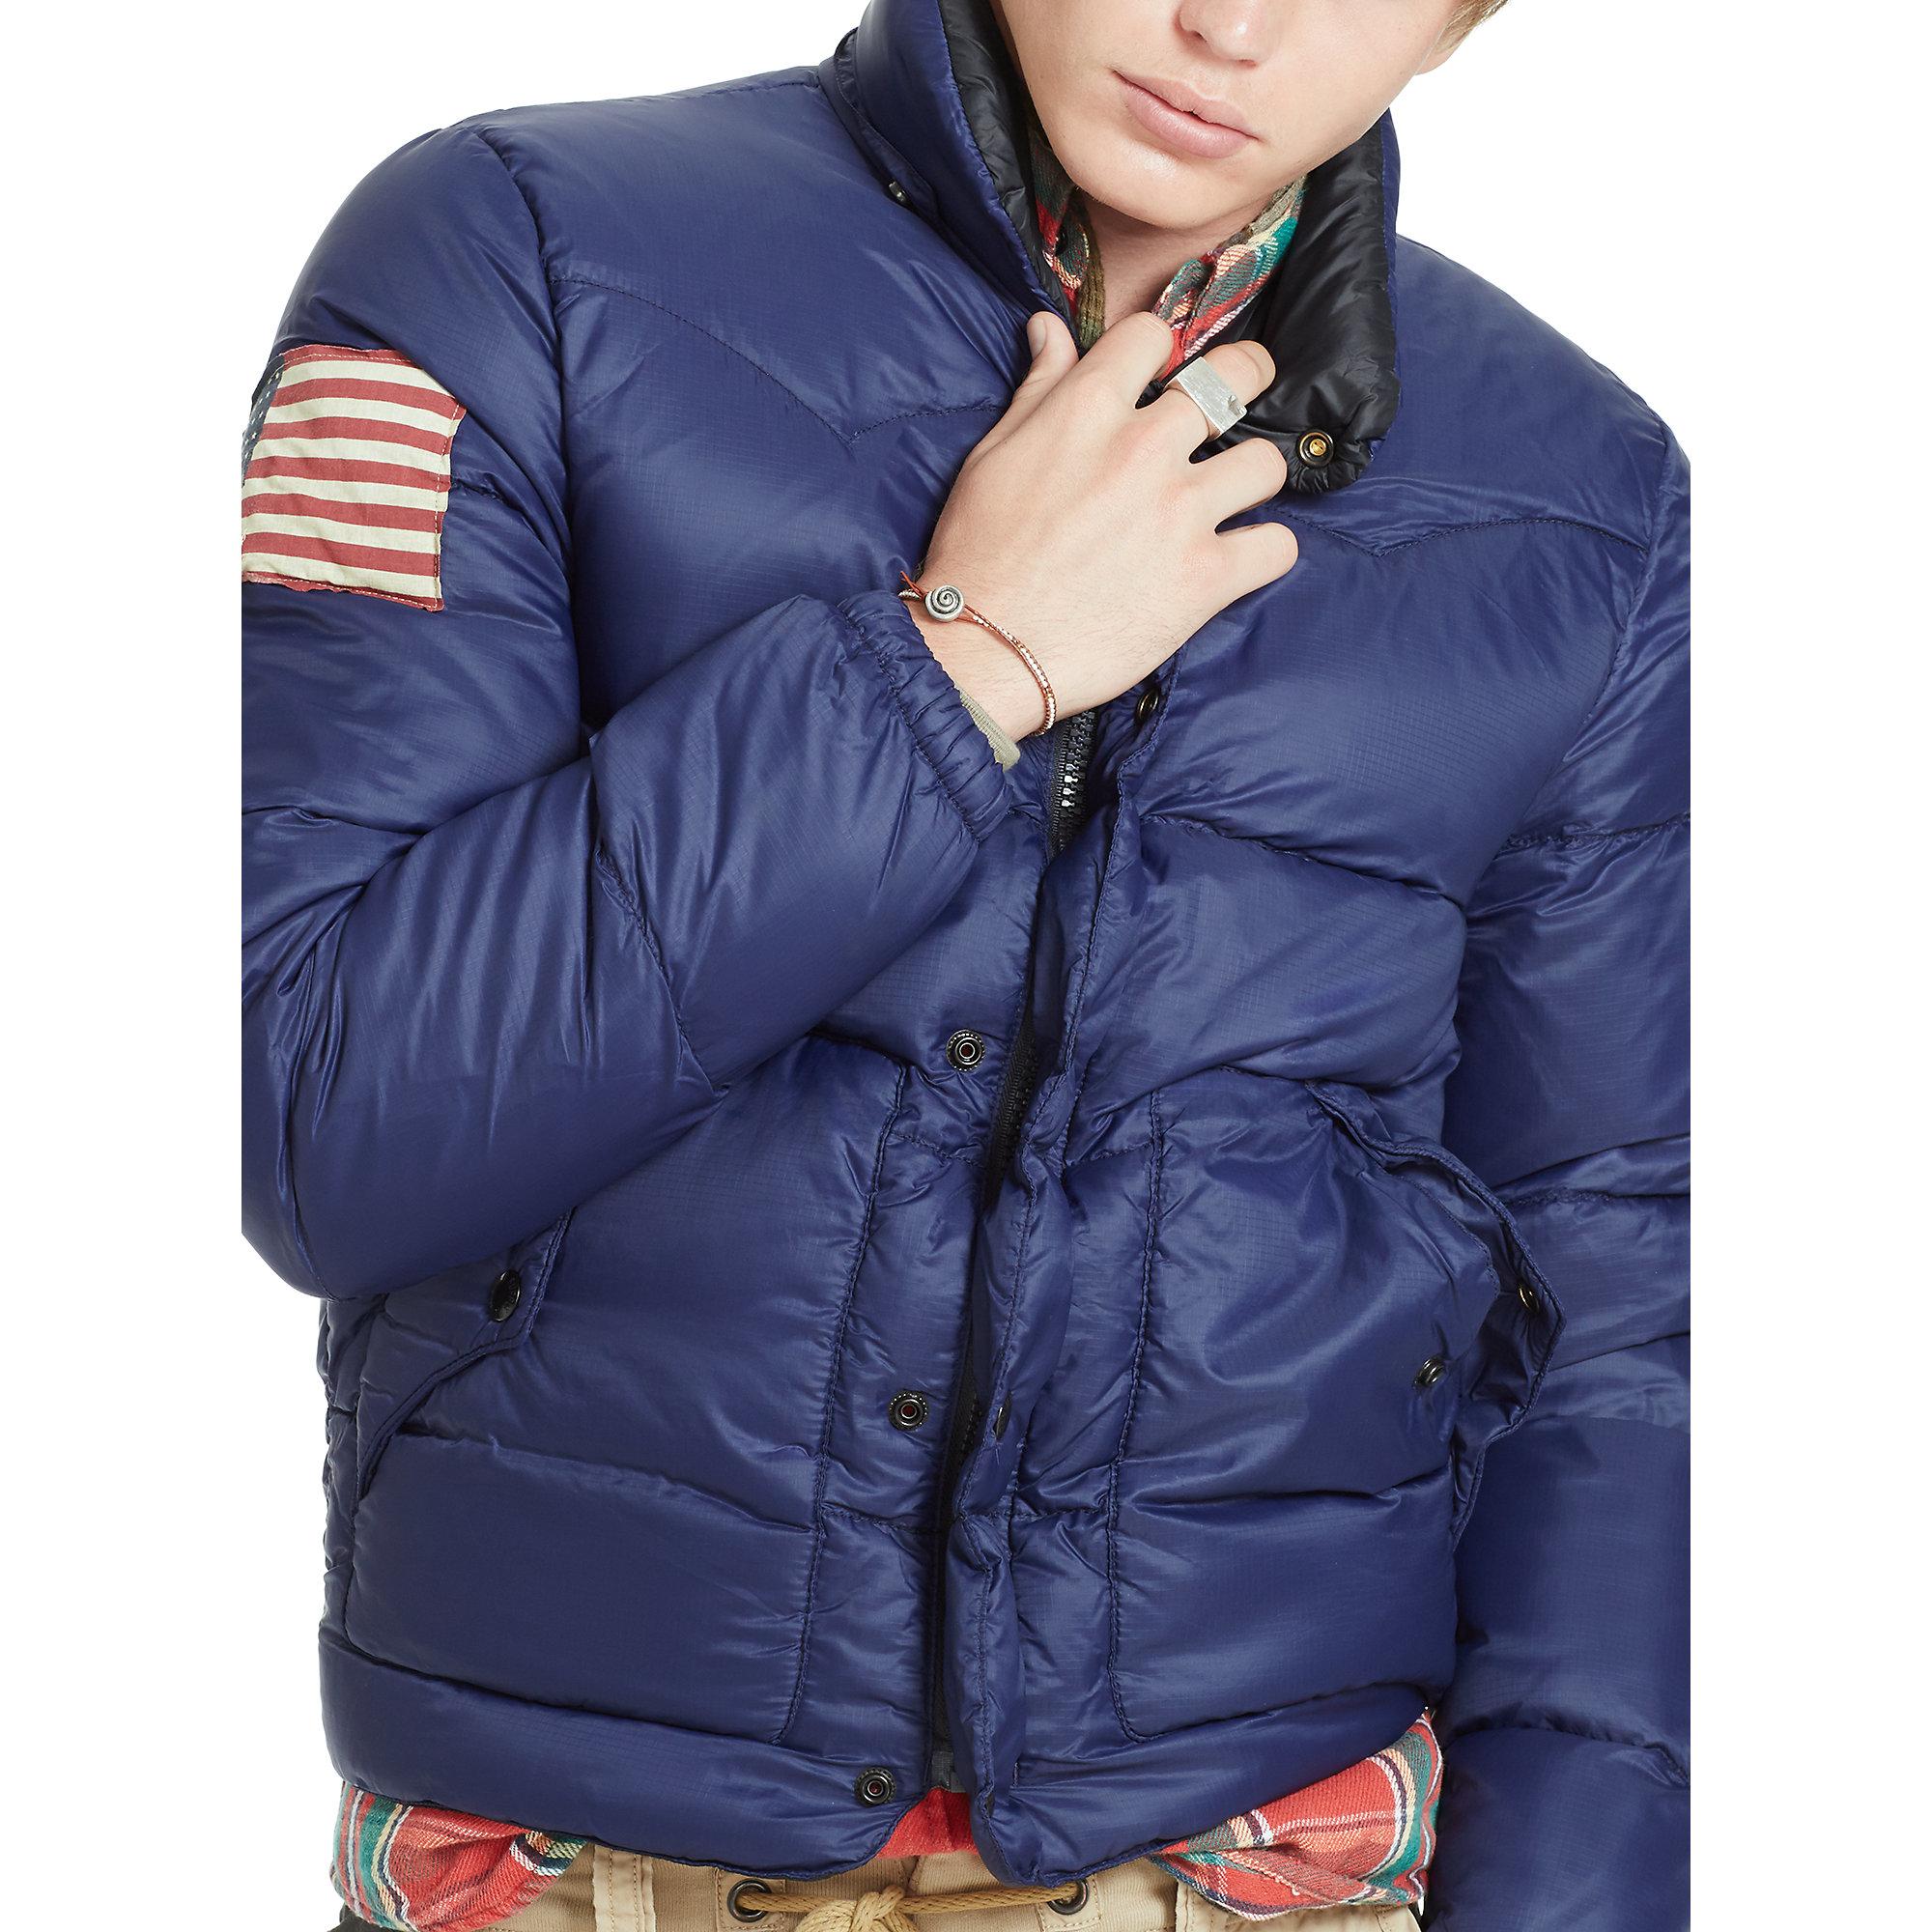 1899075e96ba1e denim-supply-ralph-lauren-biella-navy-quilted-ripstop-down-jacket -blue-product-0-274995140-normal.jpeg